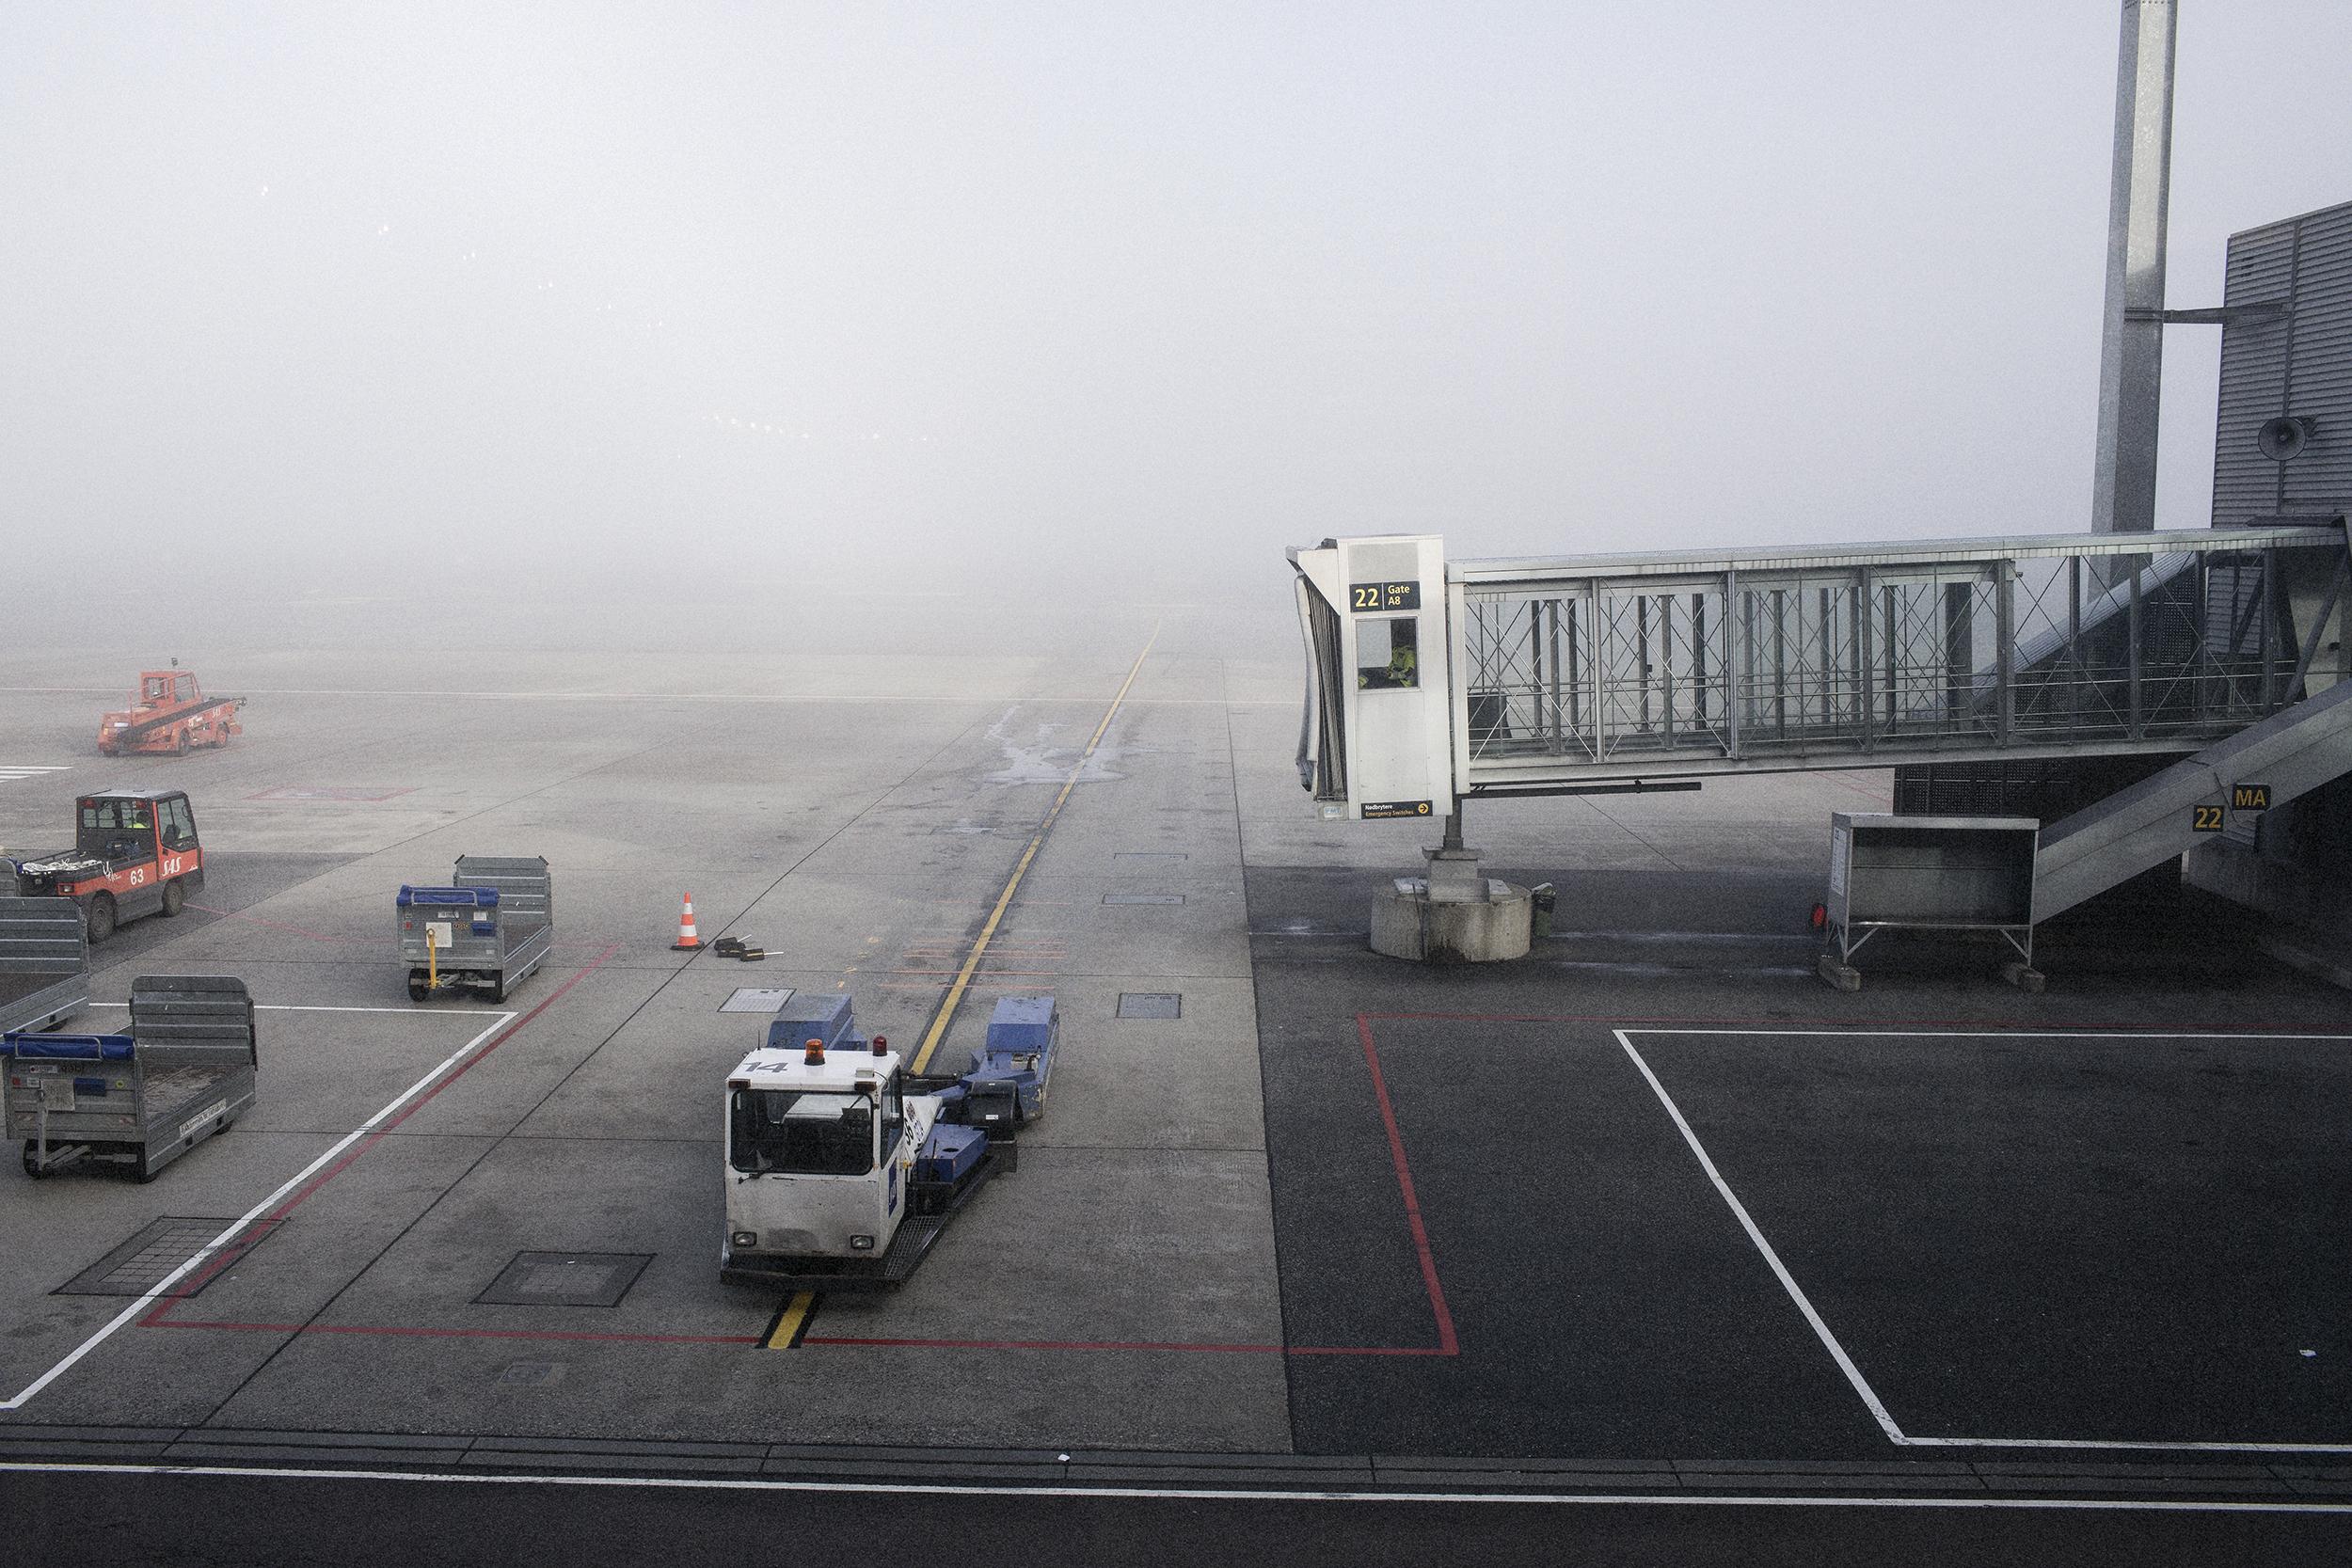 Fotograf_Nicki_Twang_Airports_forside_001